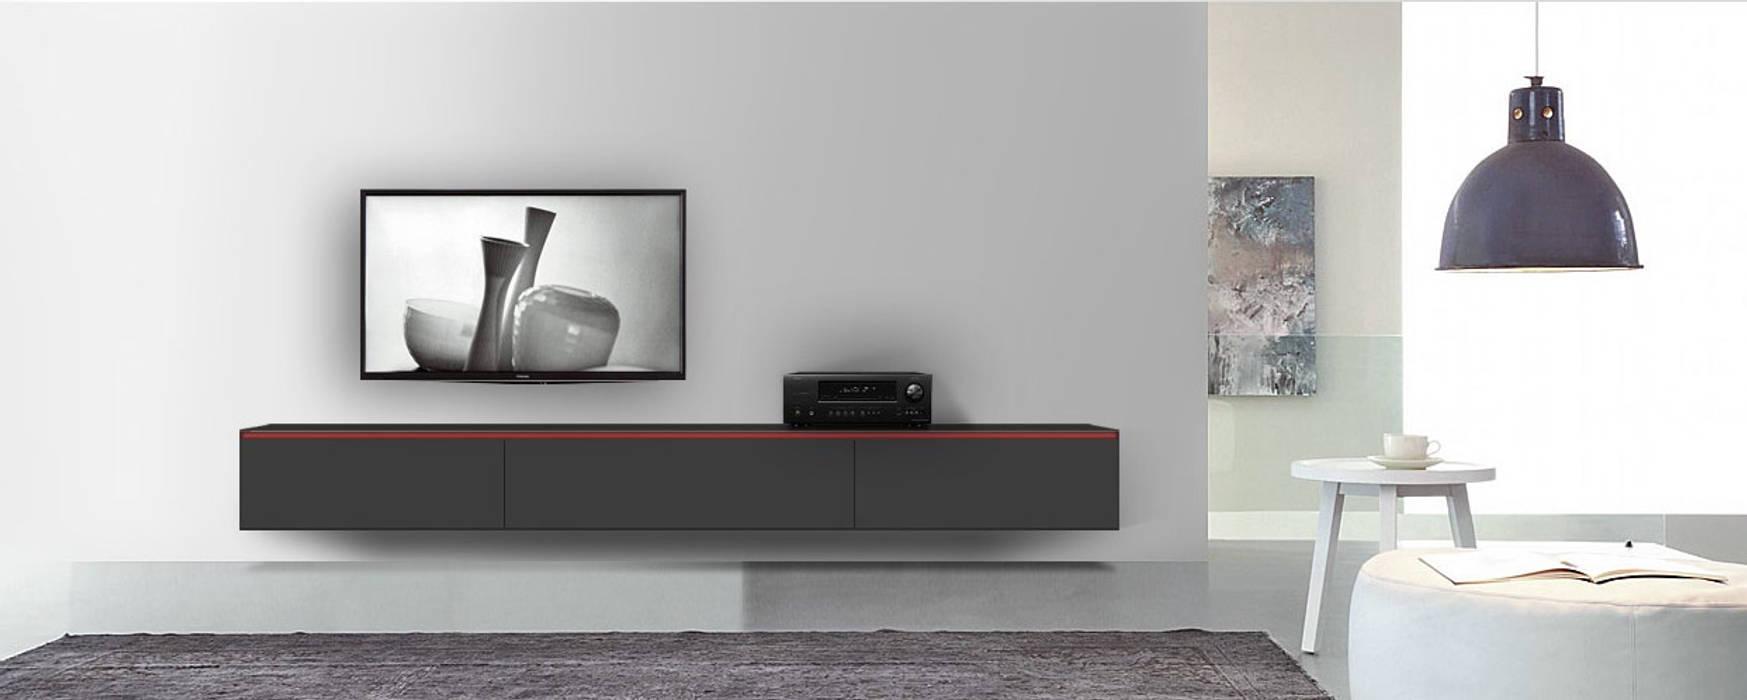 Reverse Tv Lowboard Konfigurator 3m Schwarz Matt Mit Griff Rot